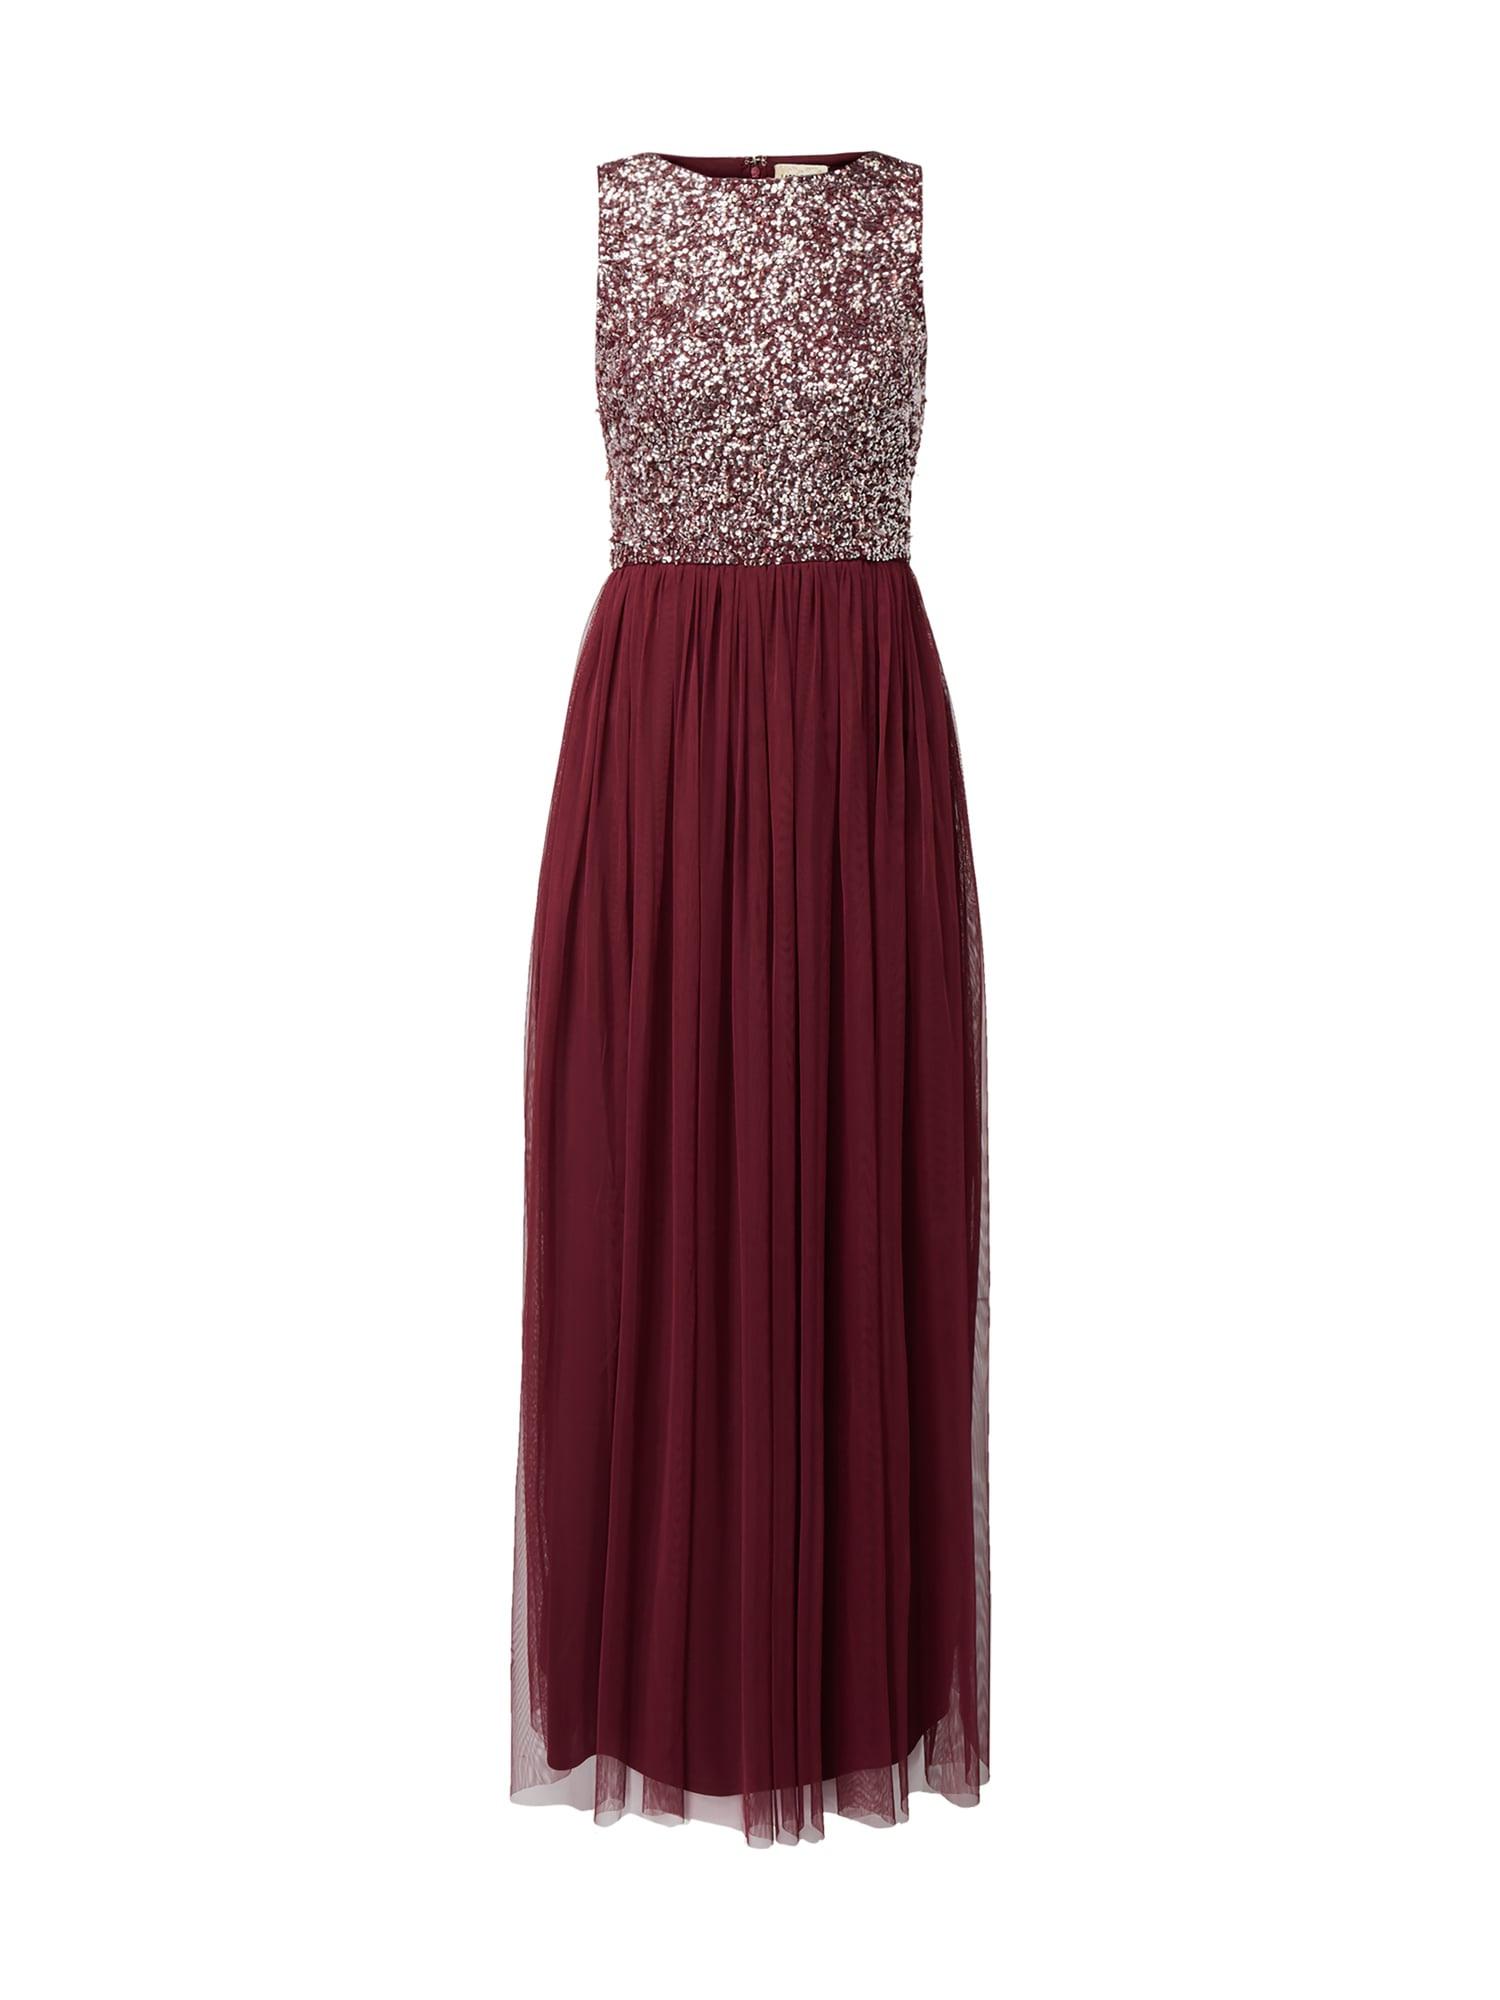 20 Luxus Abendkleid Bordeaux Bester Preis15 Schön Abendkleid Bordeaux Stylish